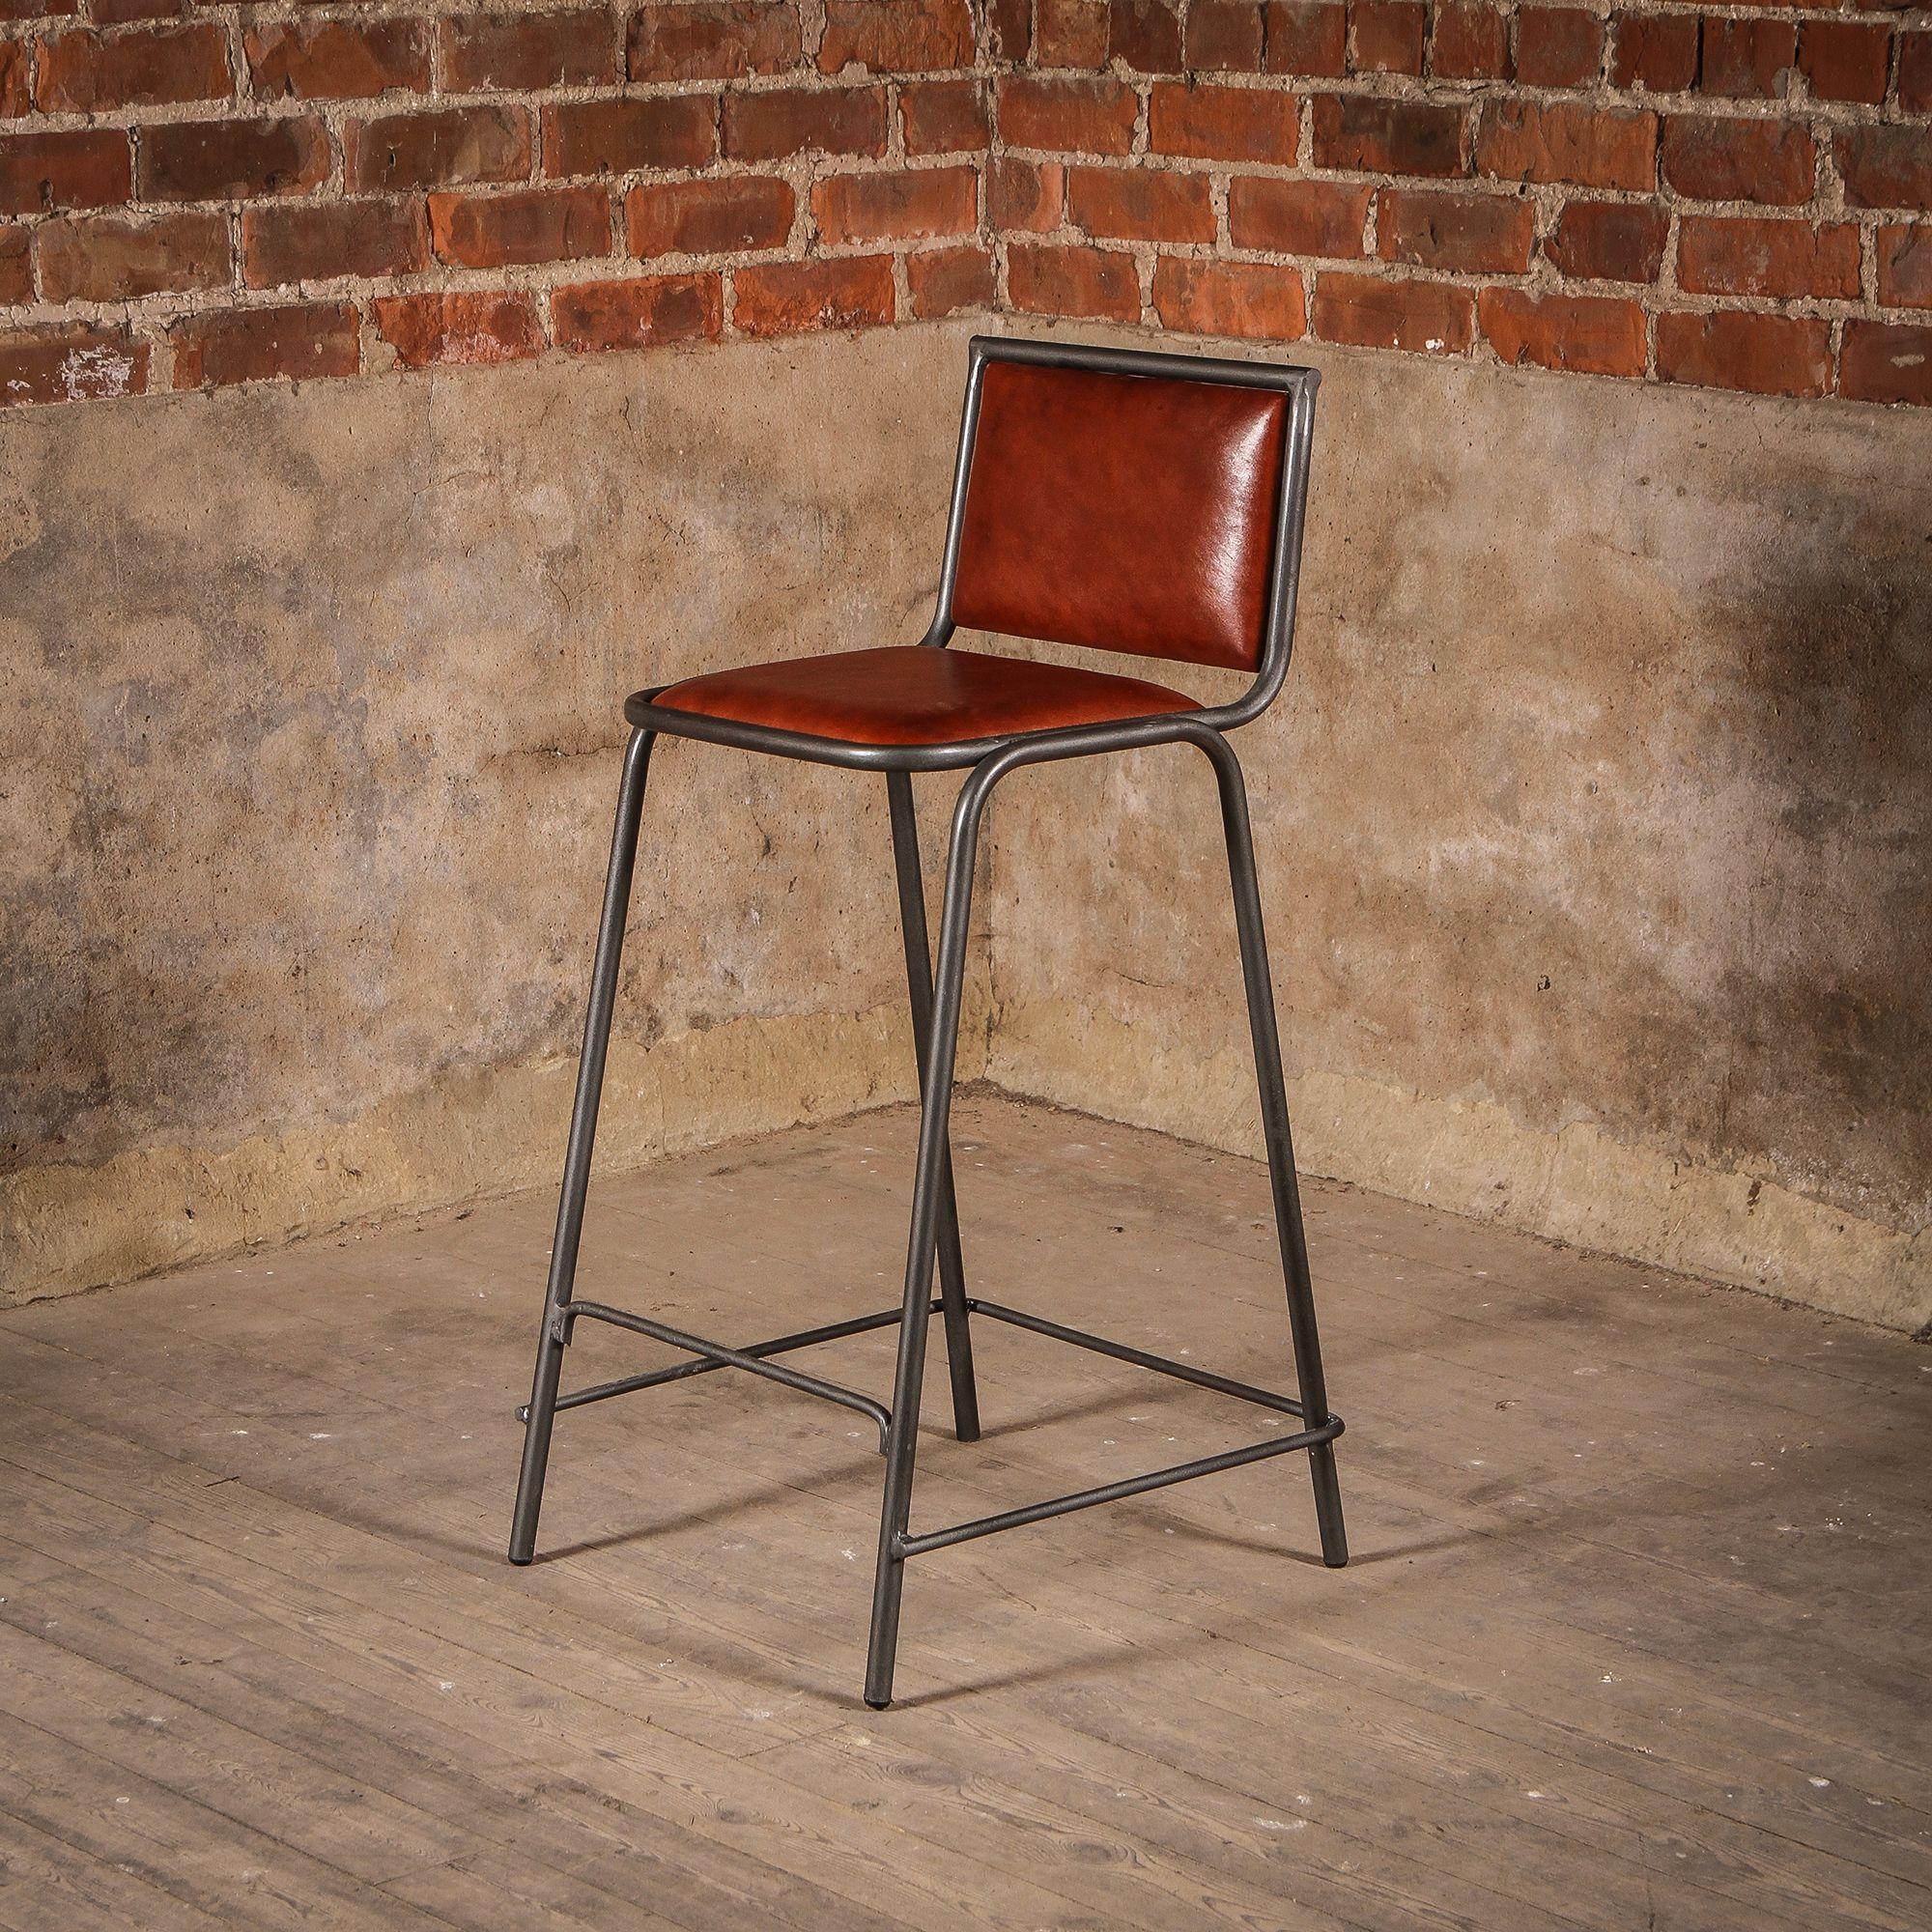 Vintage Leather Metal Acre Bar Stool Modern Bar Stools Bar Stools Bar Stool Furniture